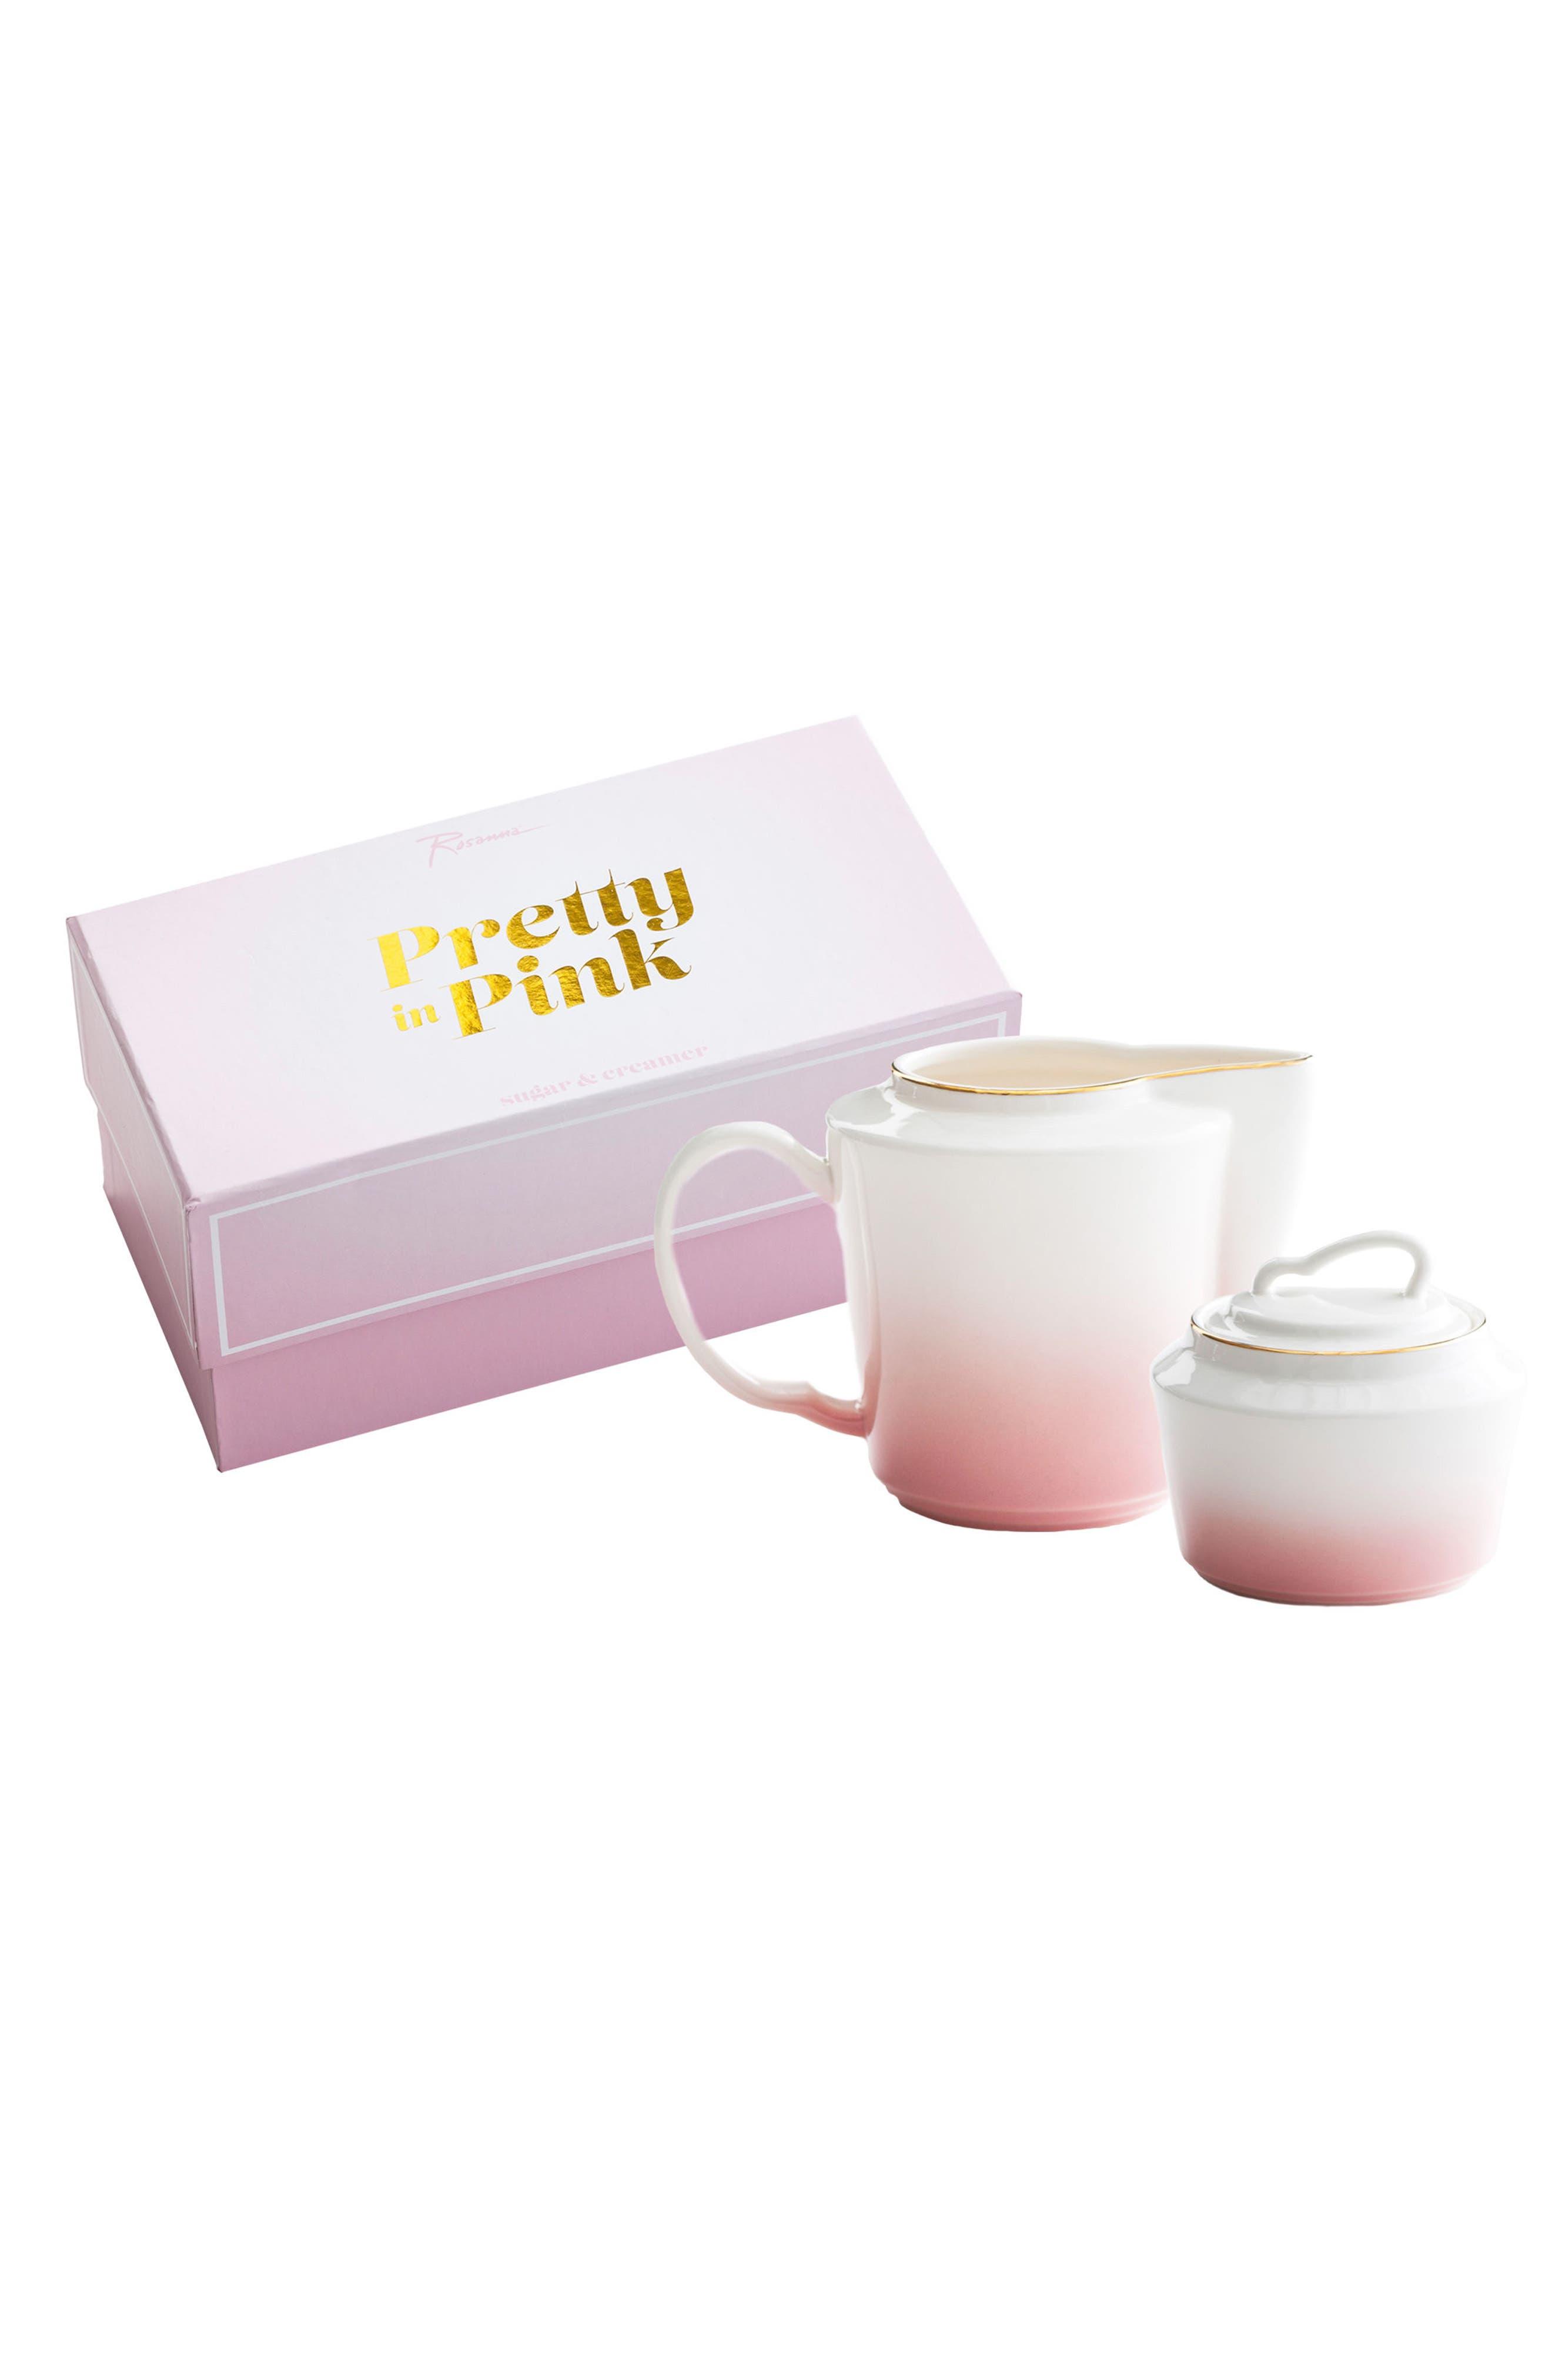 Pretty In Pink Porcelain Creamer & Sugar Bowl Set,                             Main thumbnail 1, color,                             Pink/ White